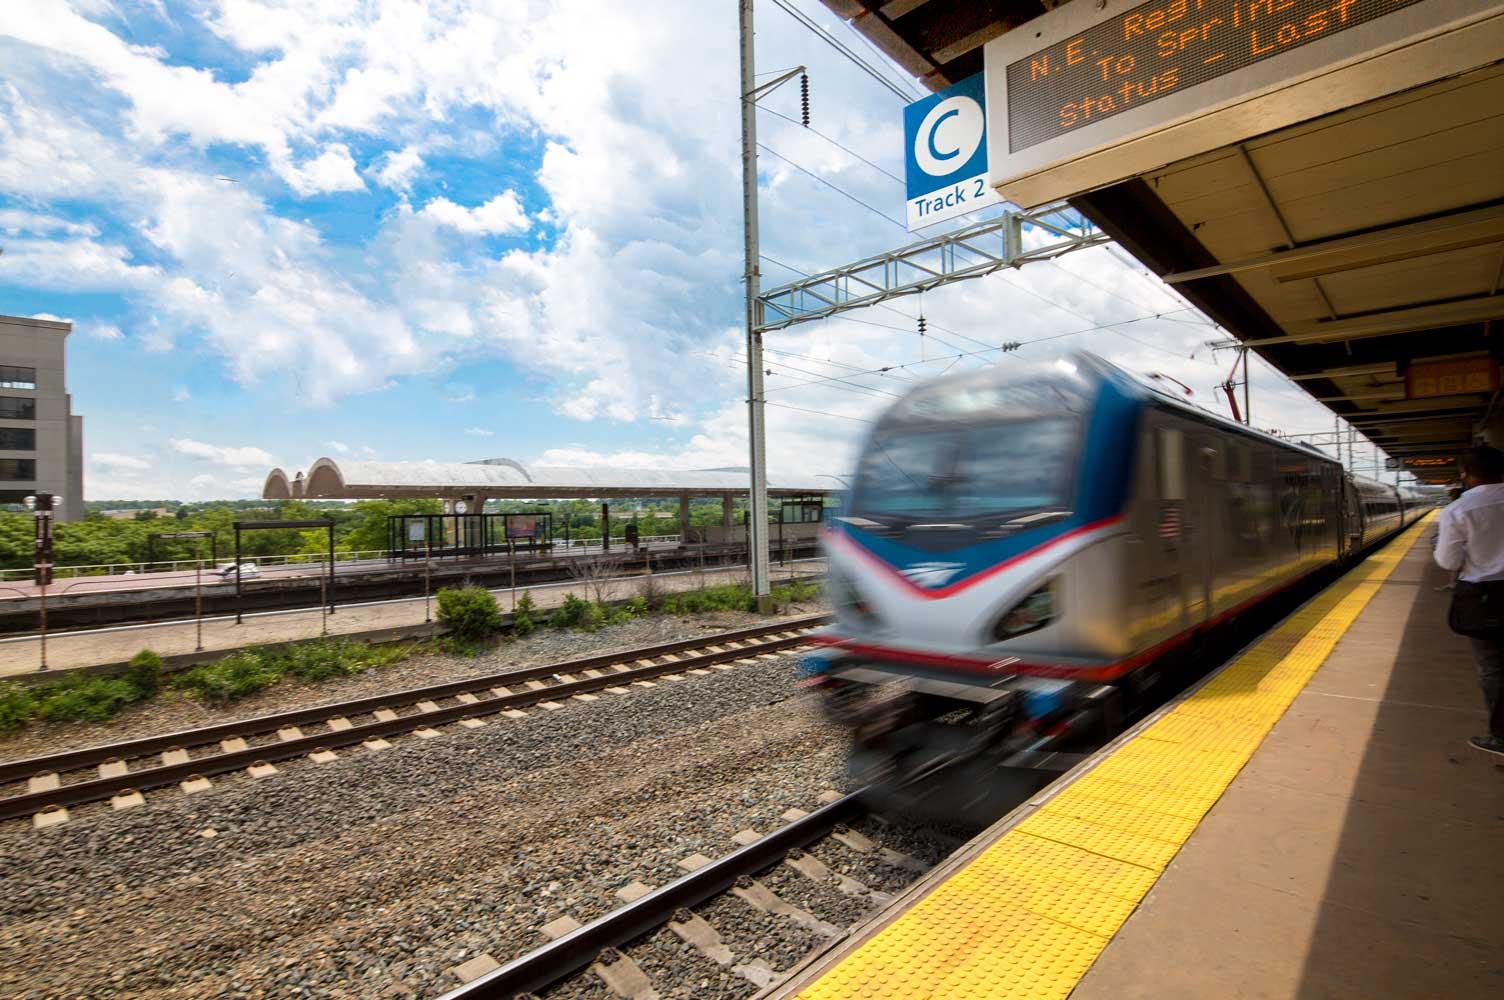 Walking distance to New Carrollton MARC train station in New Carrollton, MD